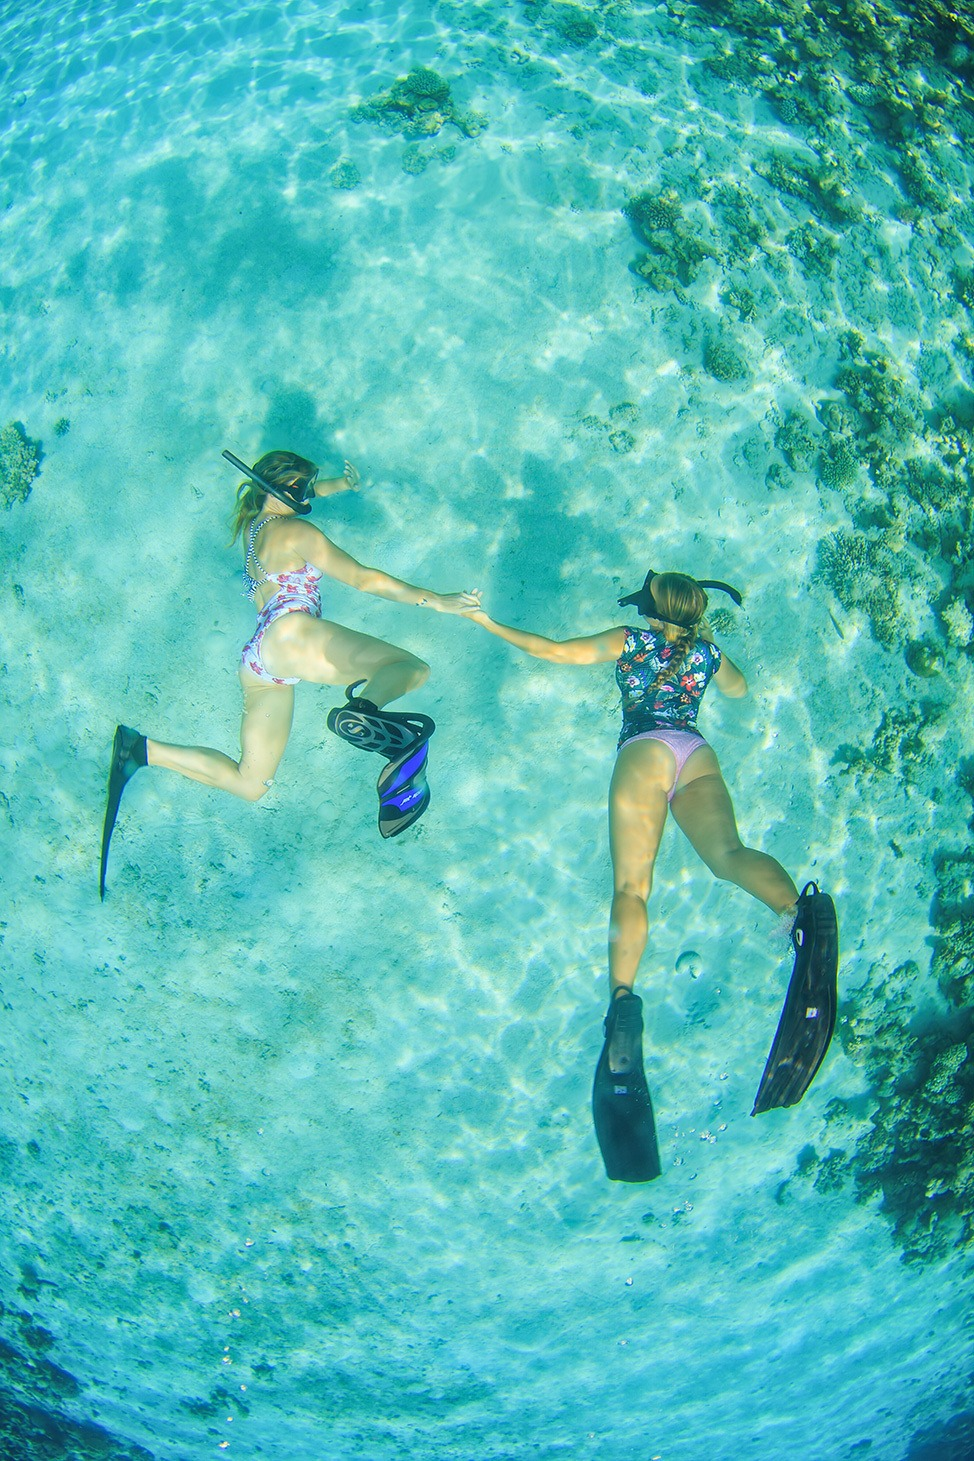 Snorkeling in Ras Abu Galum, Sinai, Egypt